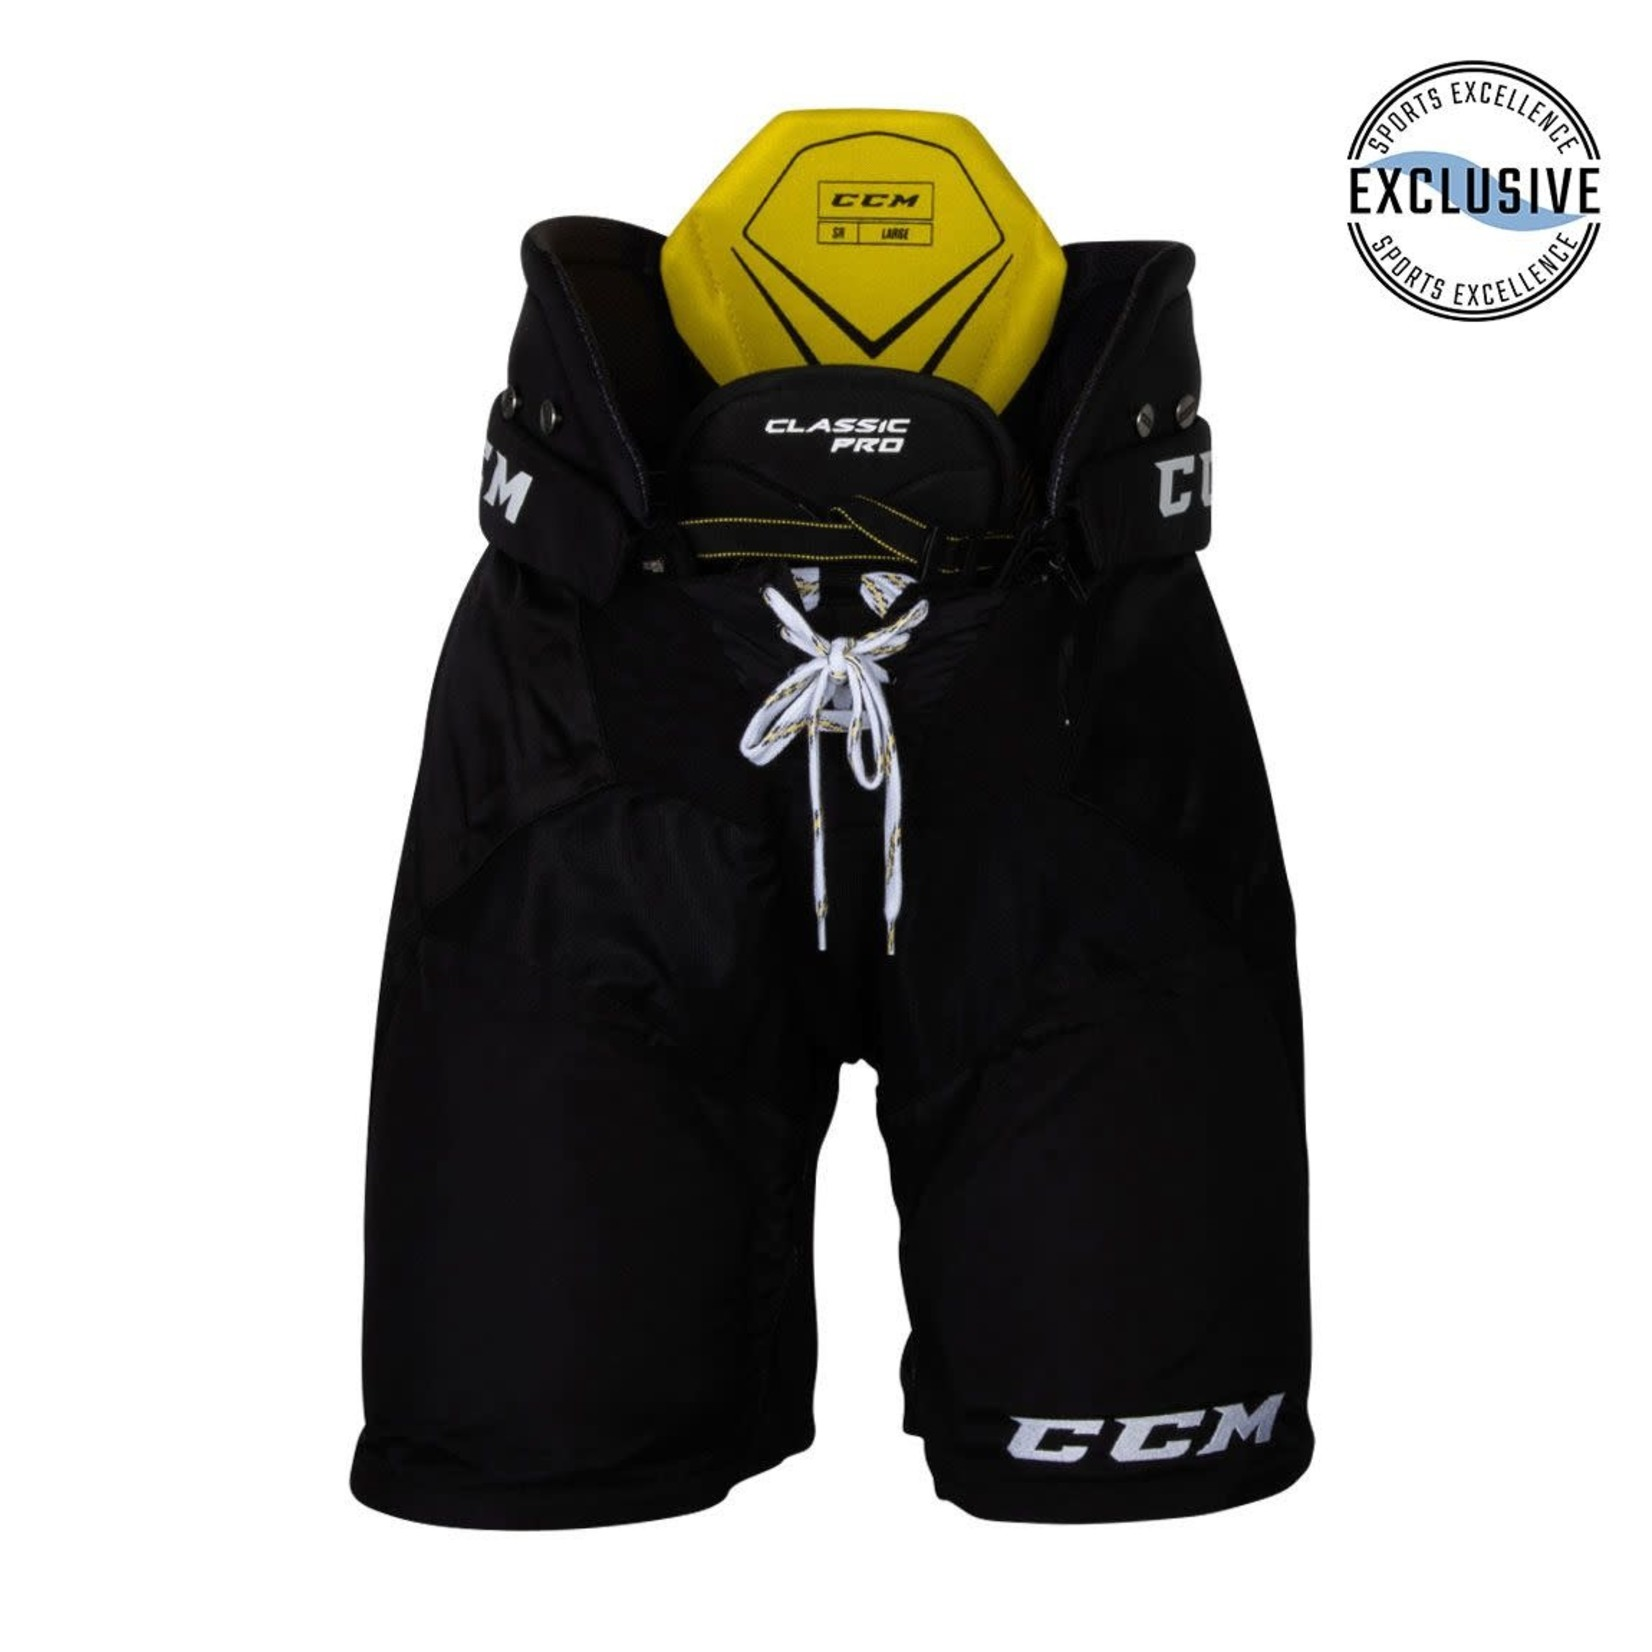 CCM CCM Hockey Pants, Tacks Classic Pro, Senior